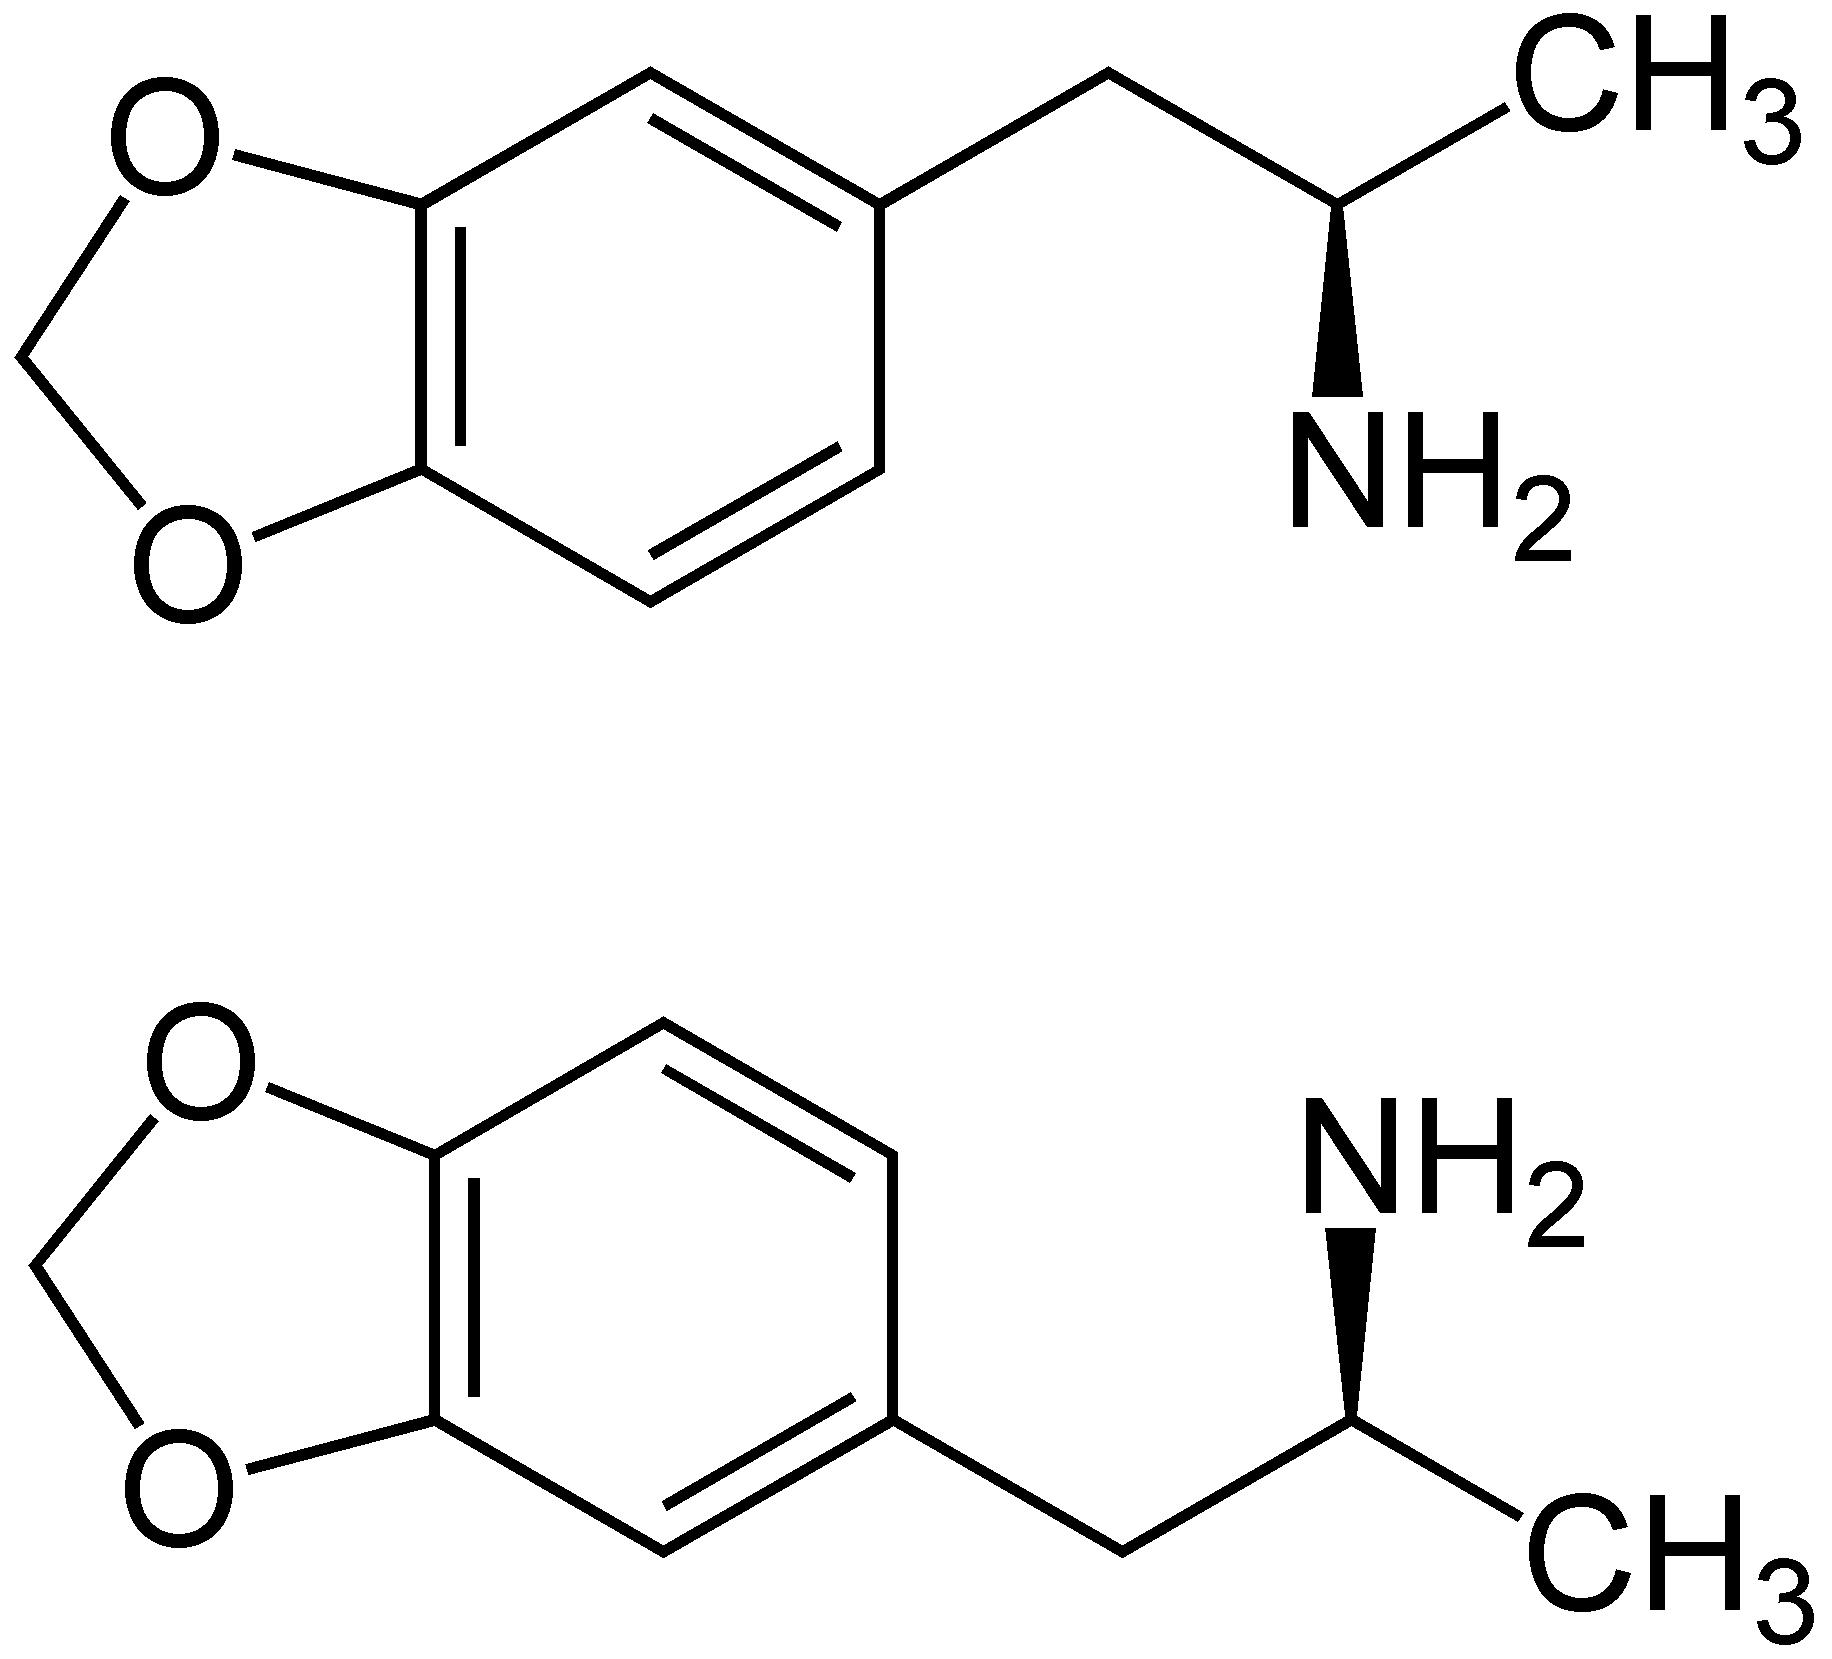 3,4 метиленедиоксиоамфетамин